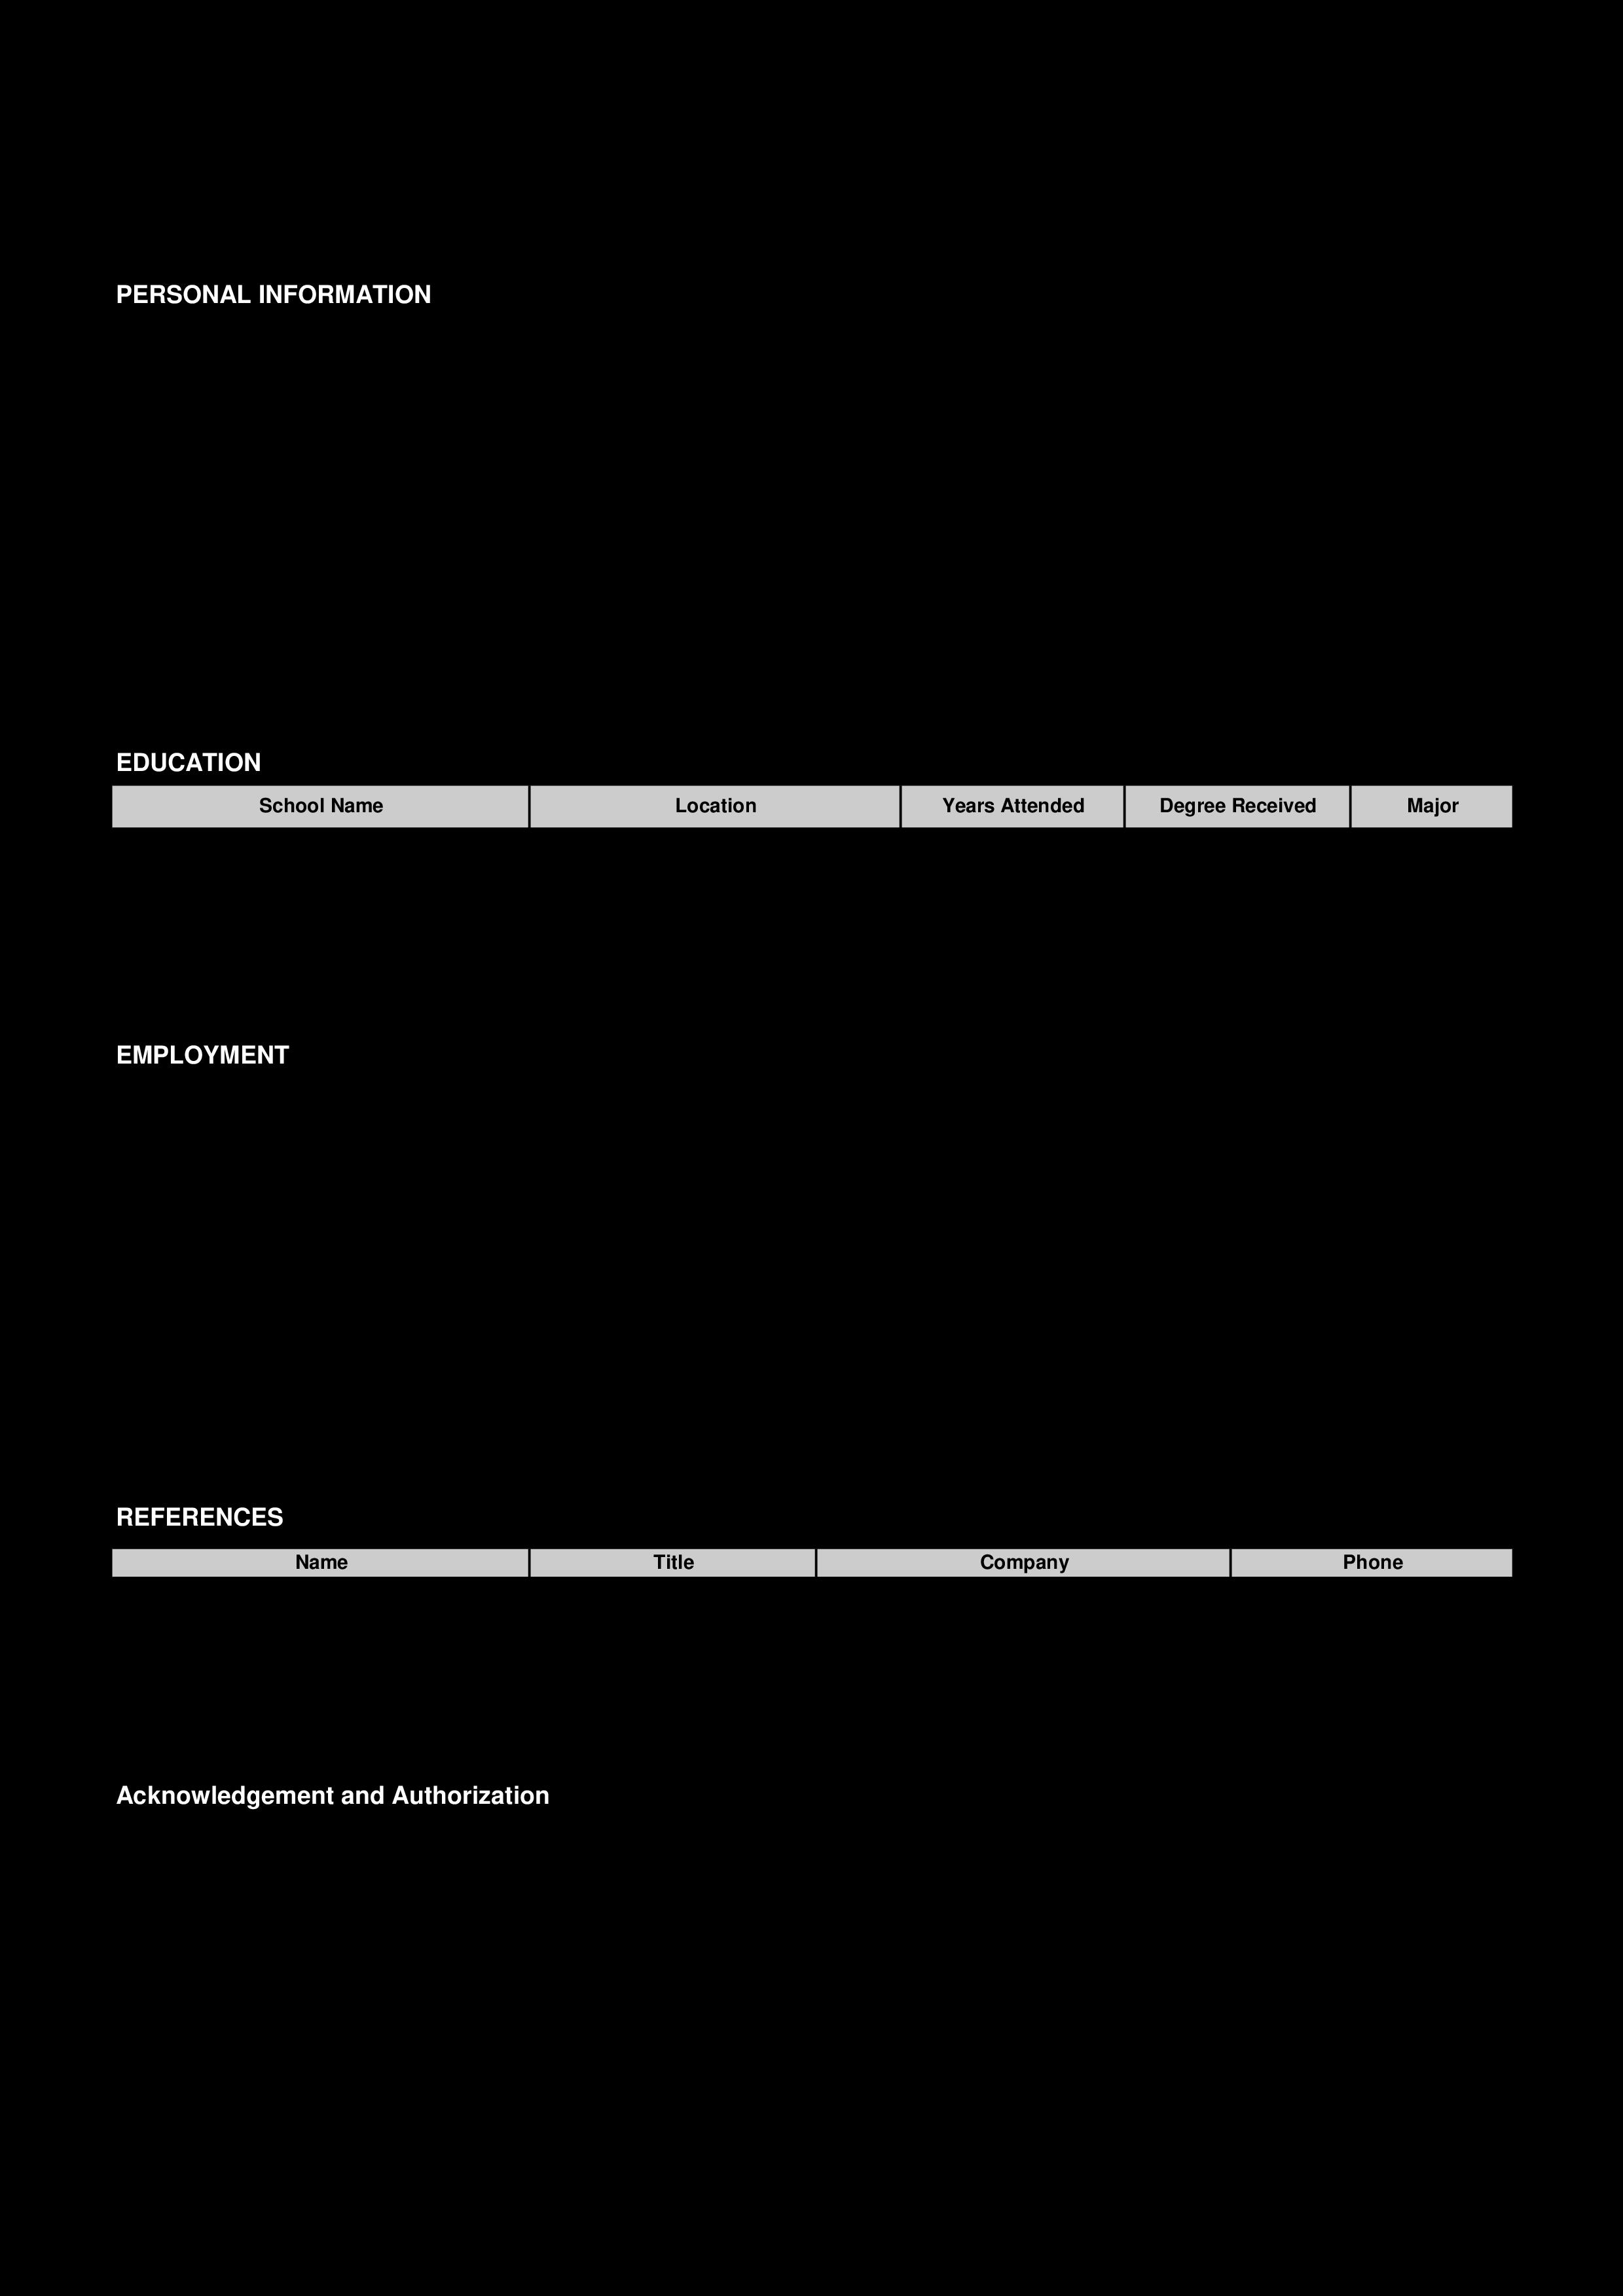 Simple Job Application Form Templates At